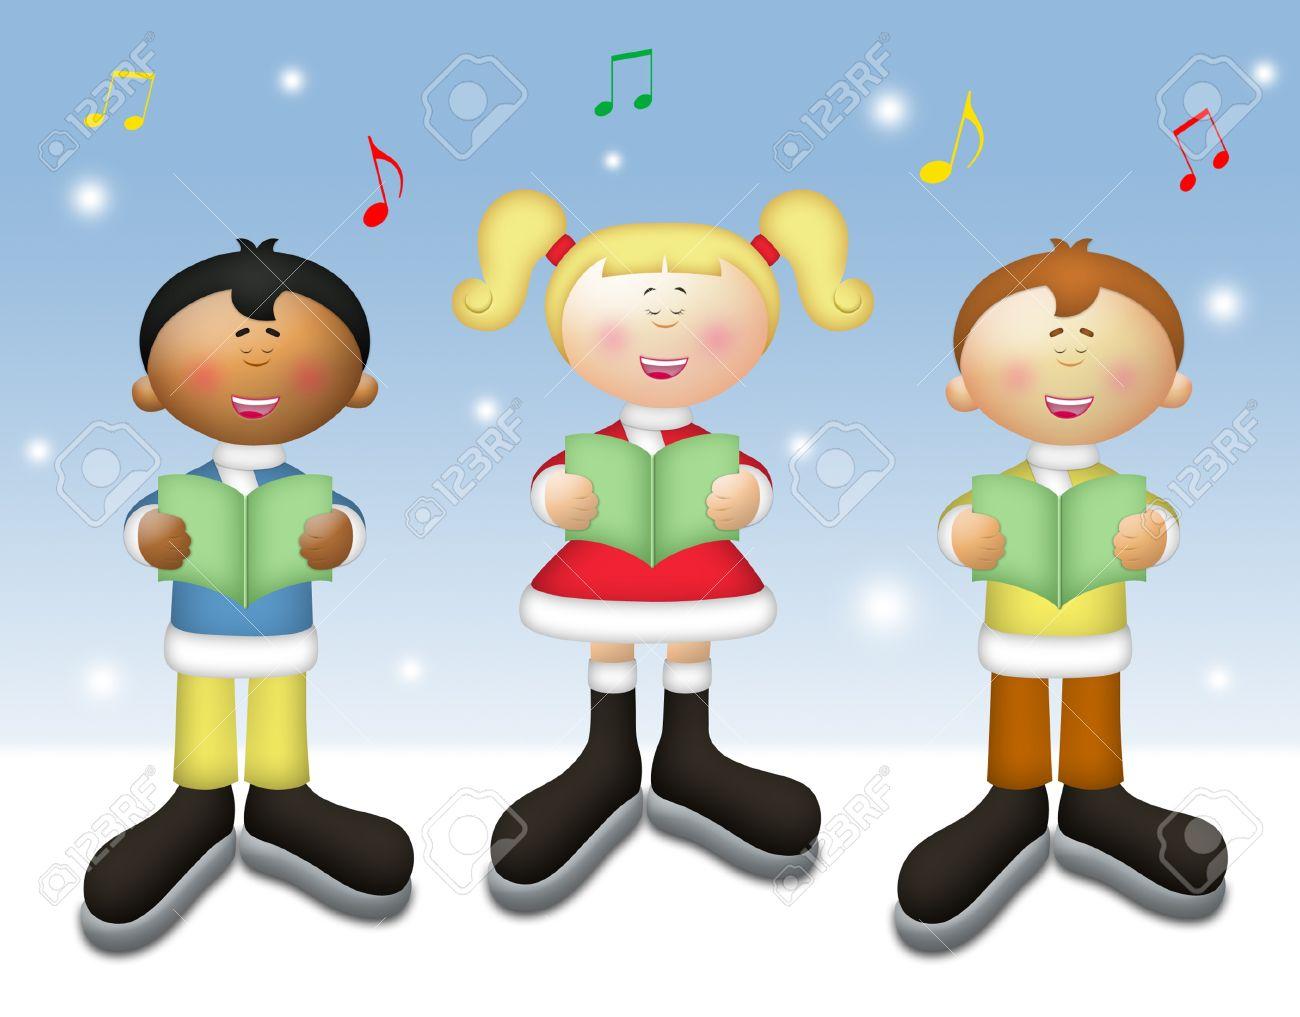 Three kids singing Christmas carols in winter setting. - 8365527